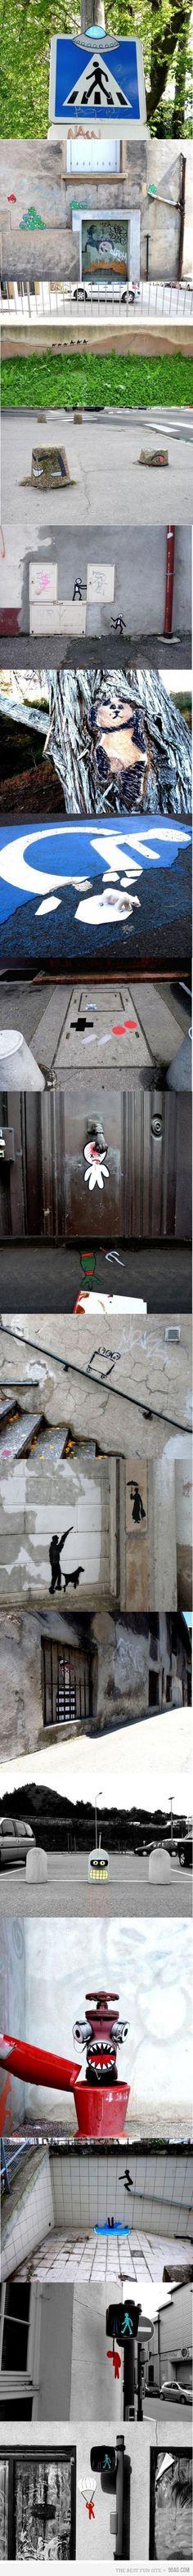 alien street art ~This is so cool!